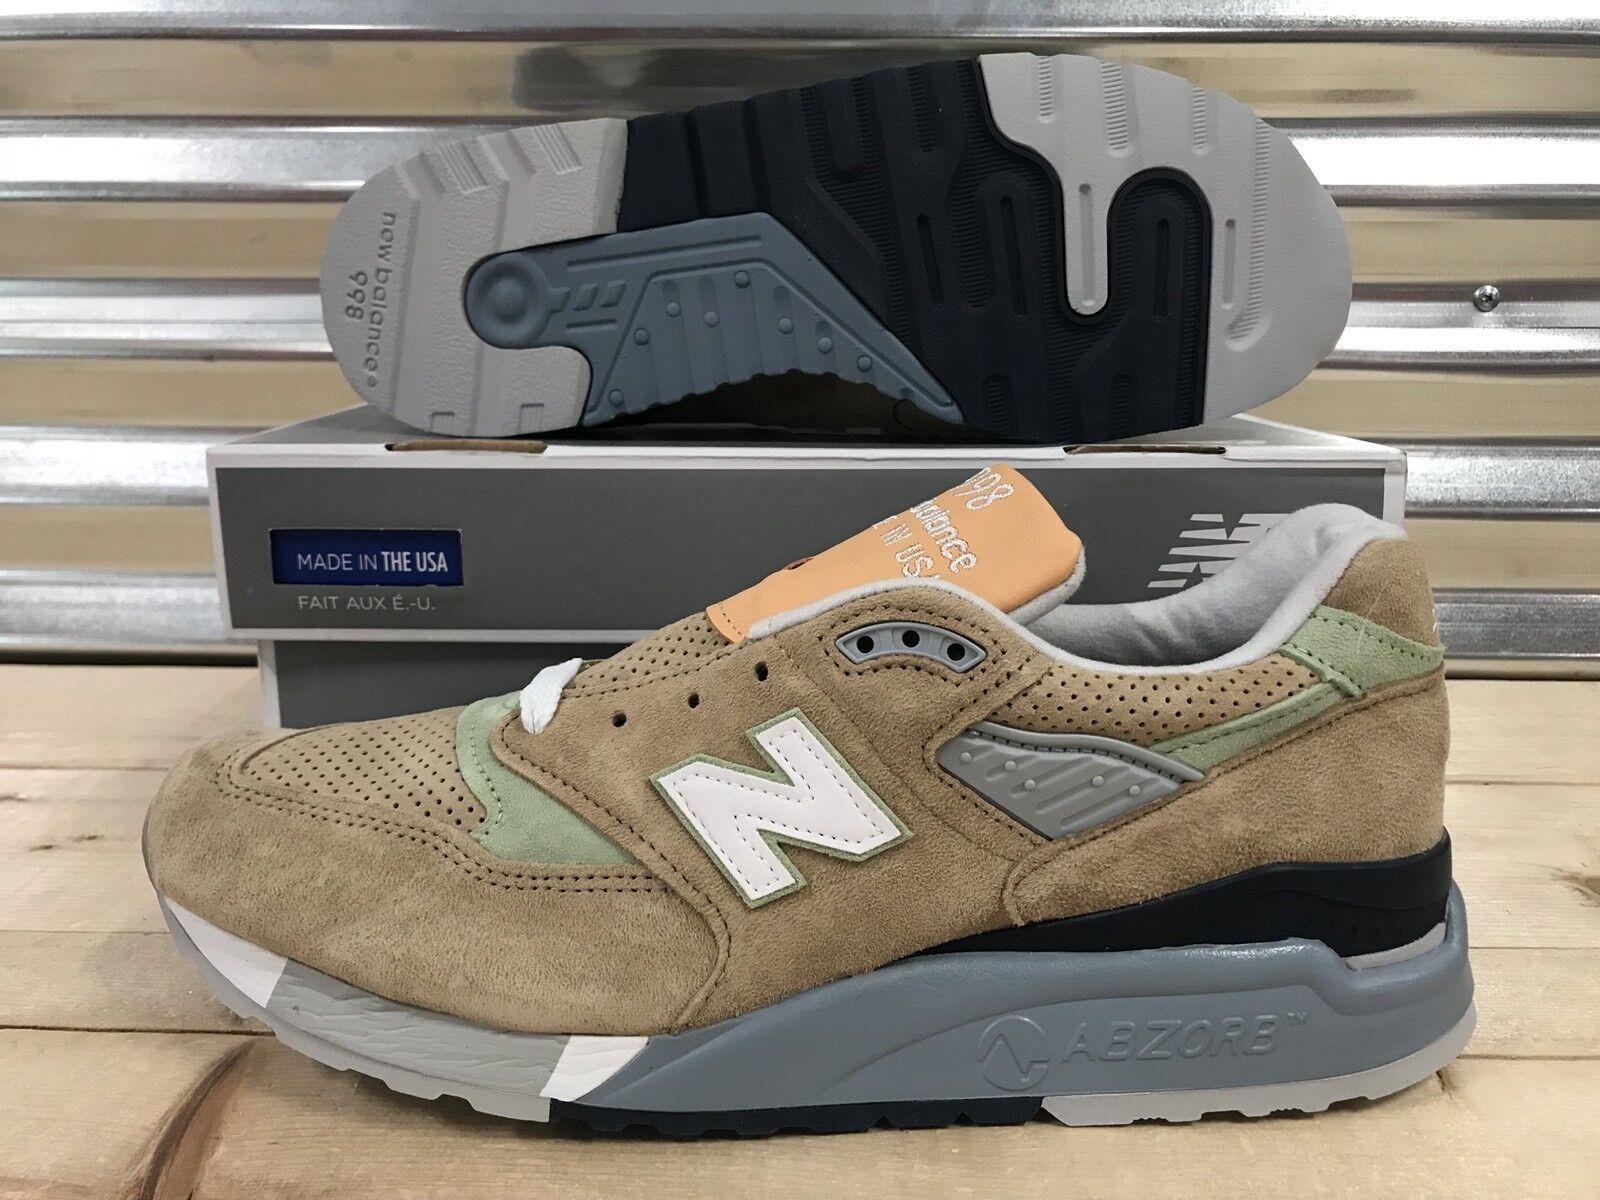 New Balance 998 Running Shoes Tan Pig Suede Green Blue White USA SZ ( M998XAA )